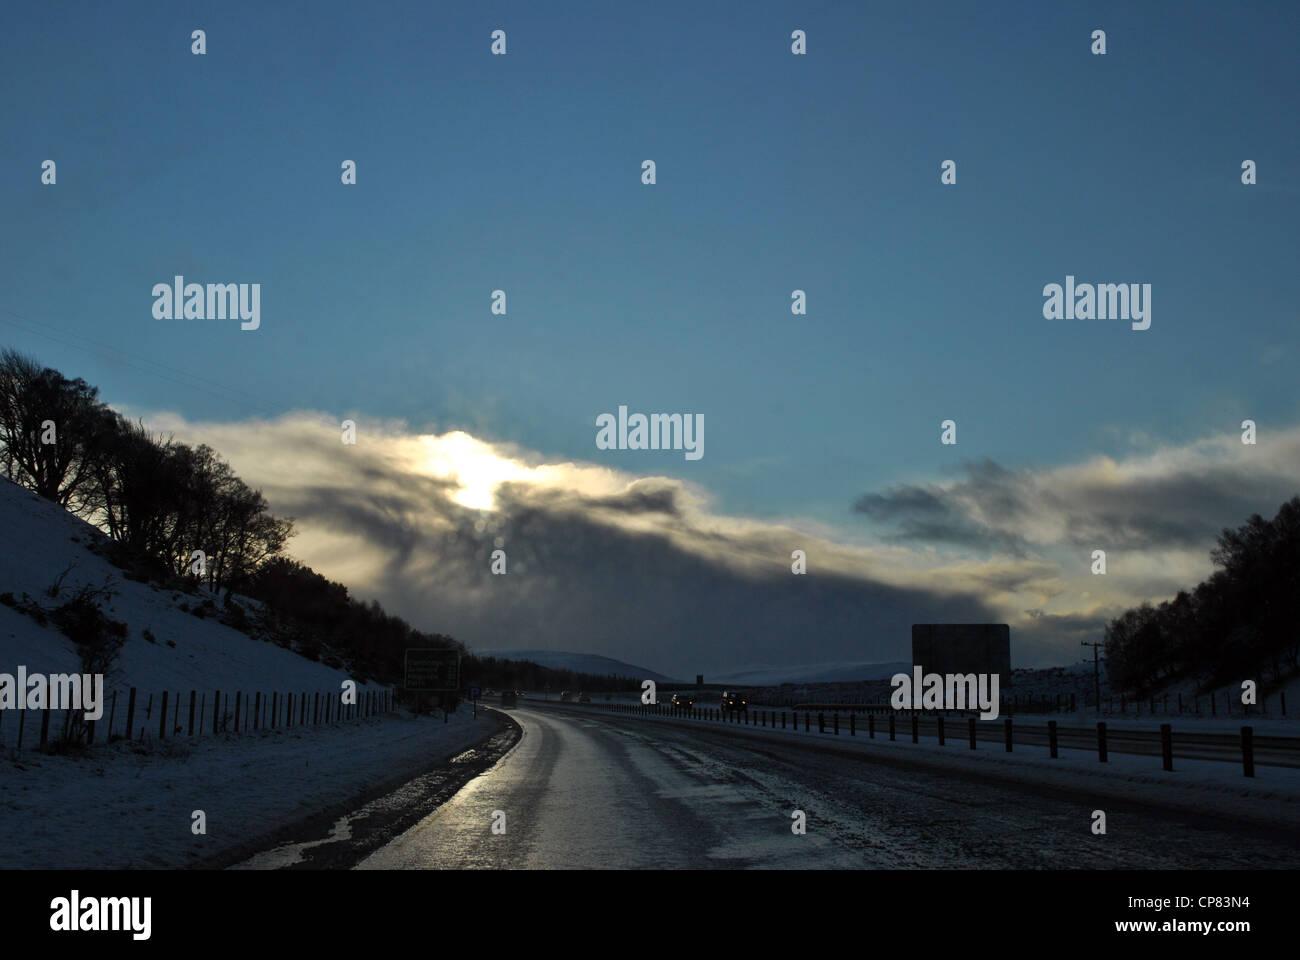 Driving A9 Winter Scotland Scottish Highlands - Stock Image